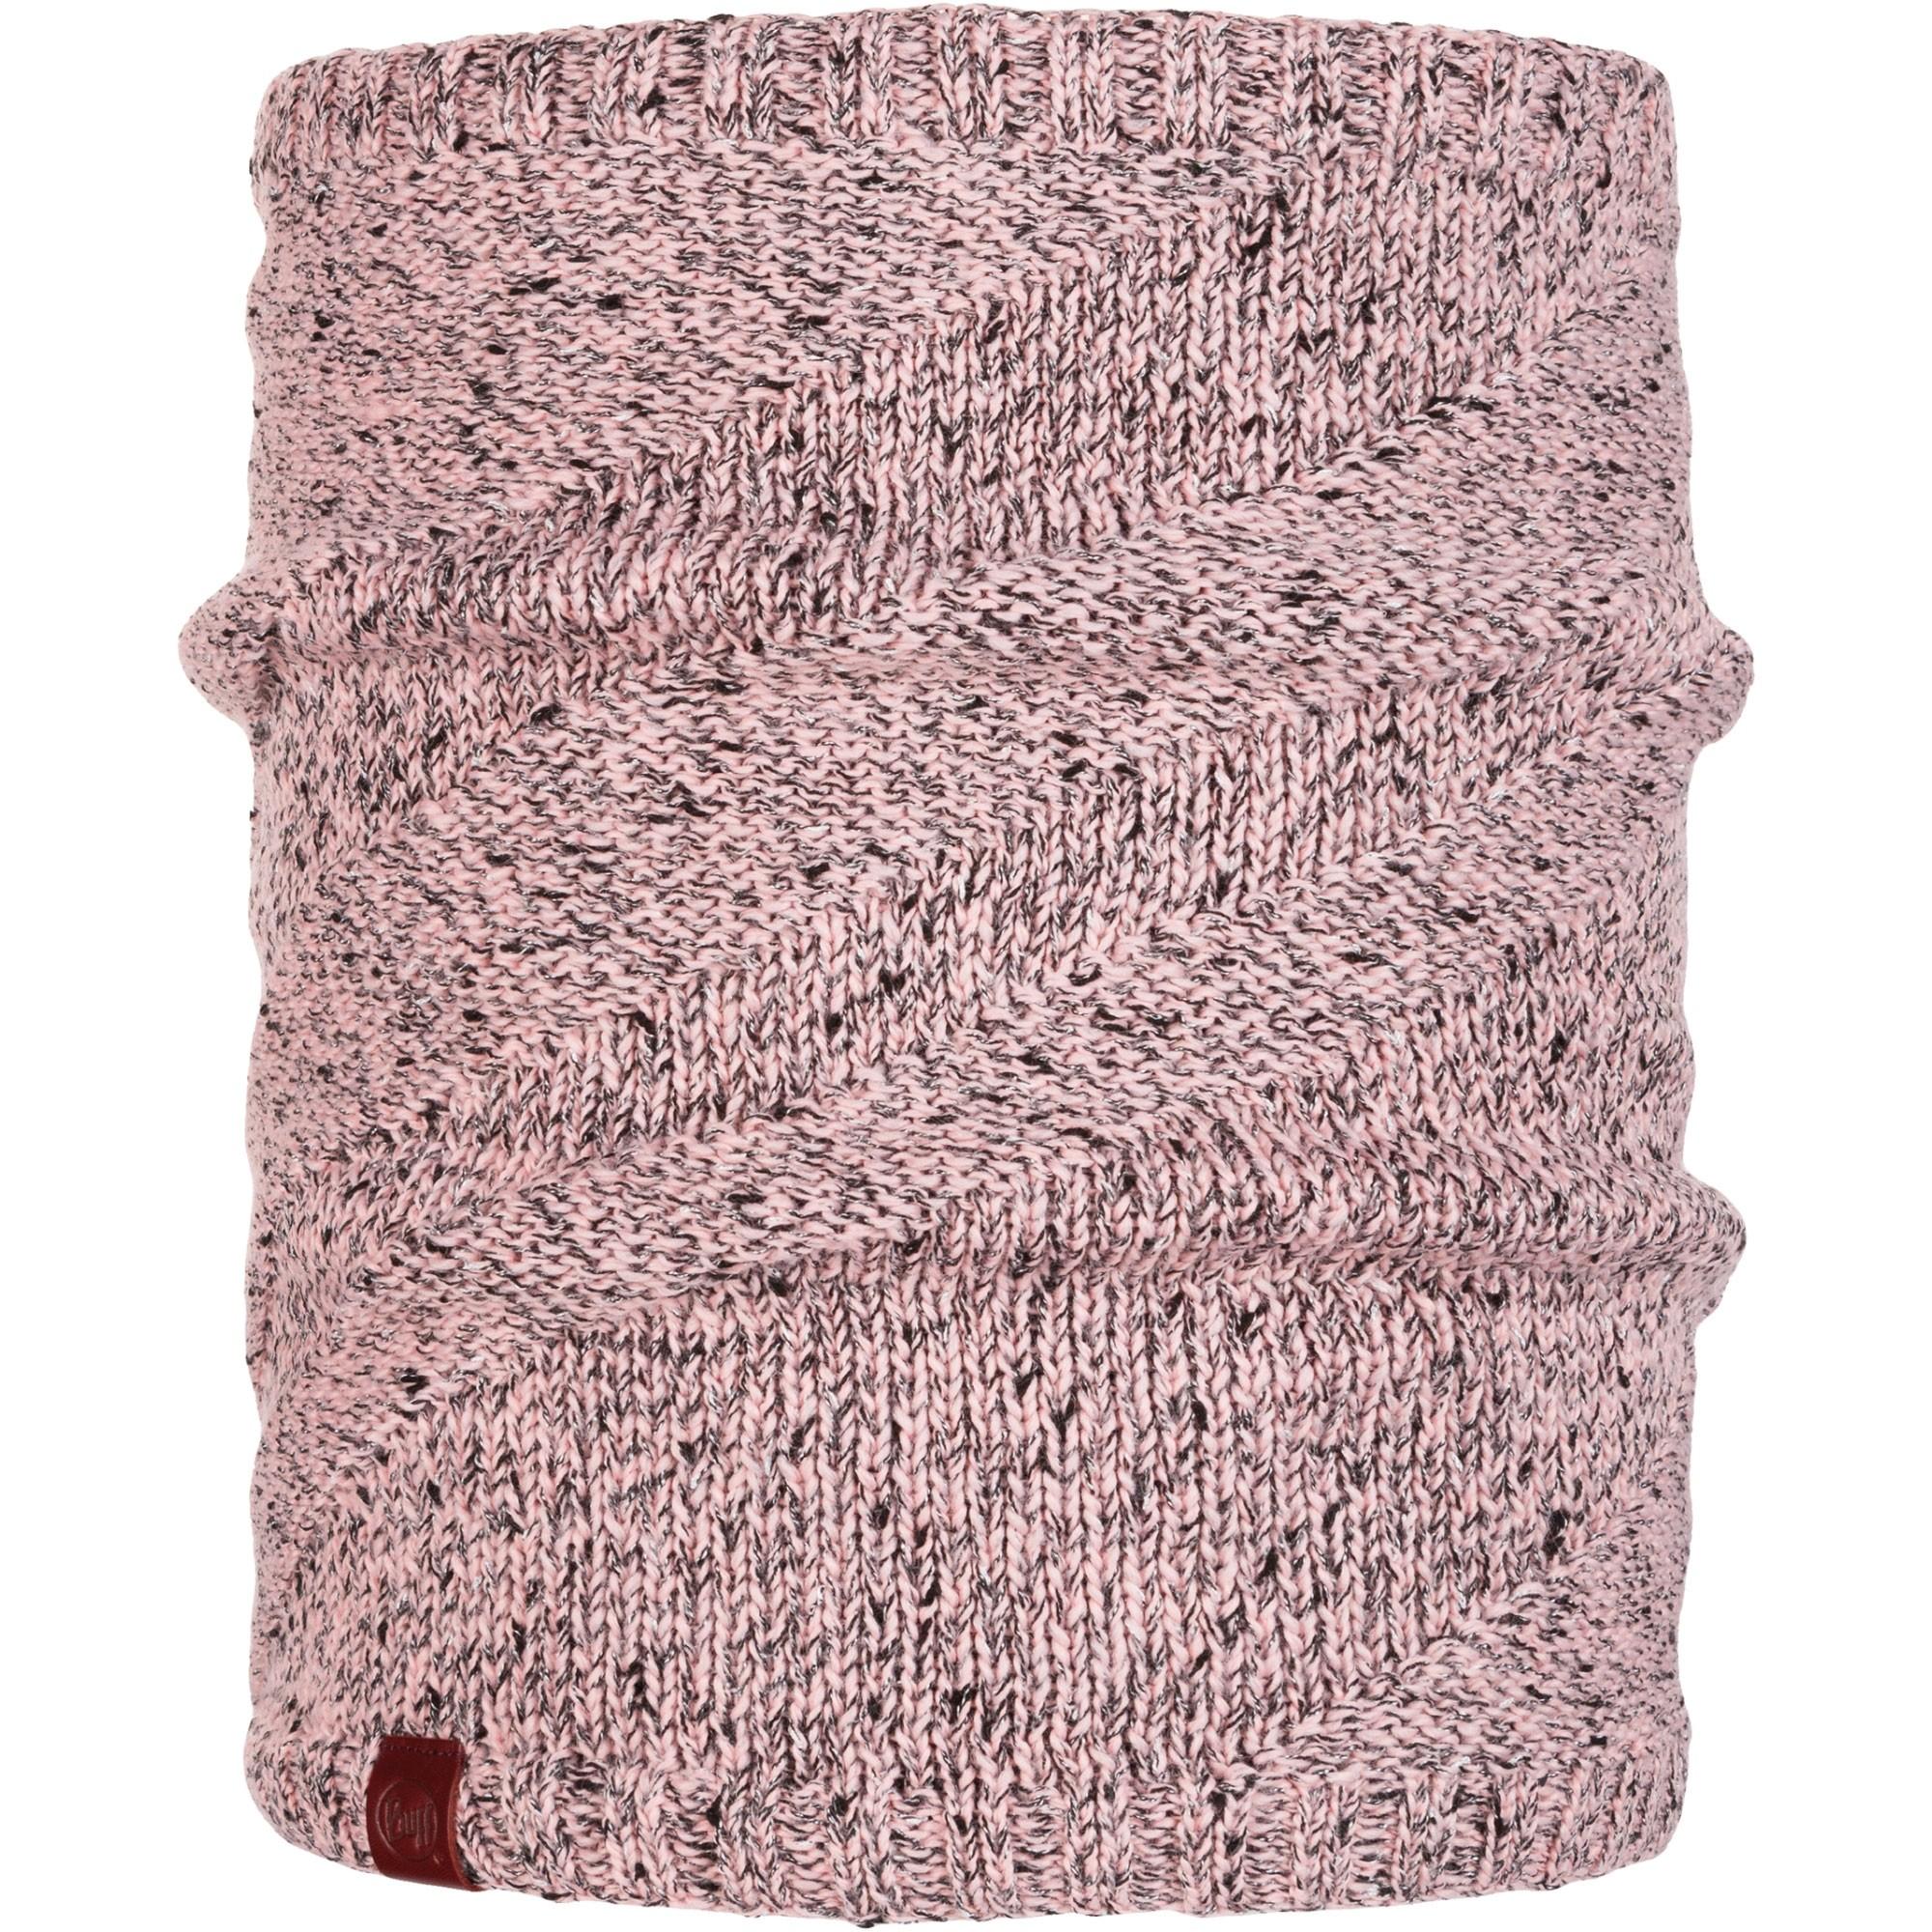 Buff Arne Neckwarmer - Pale Pink